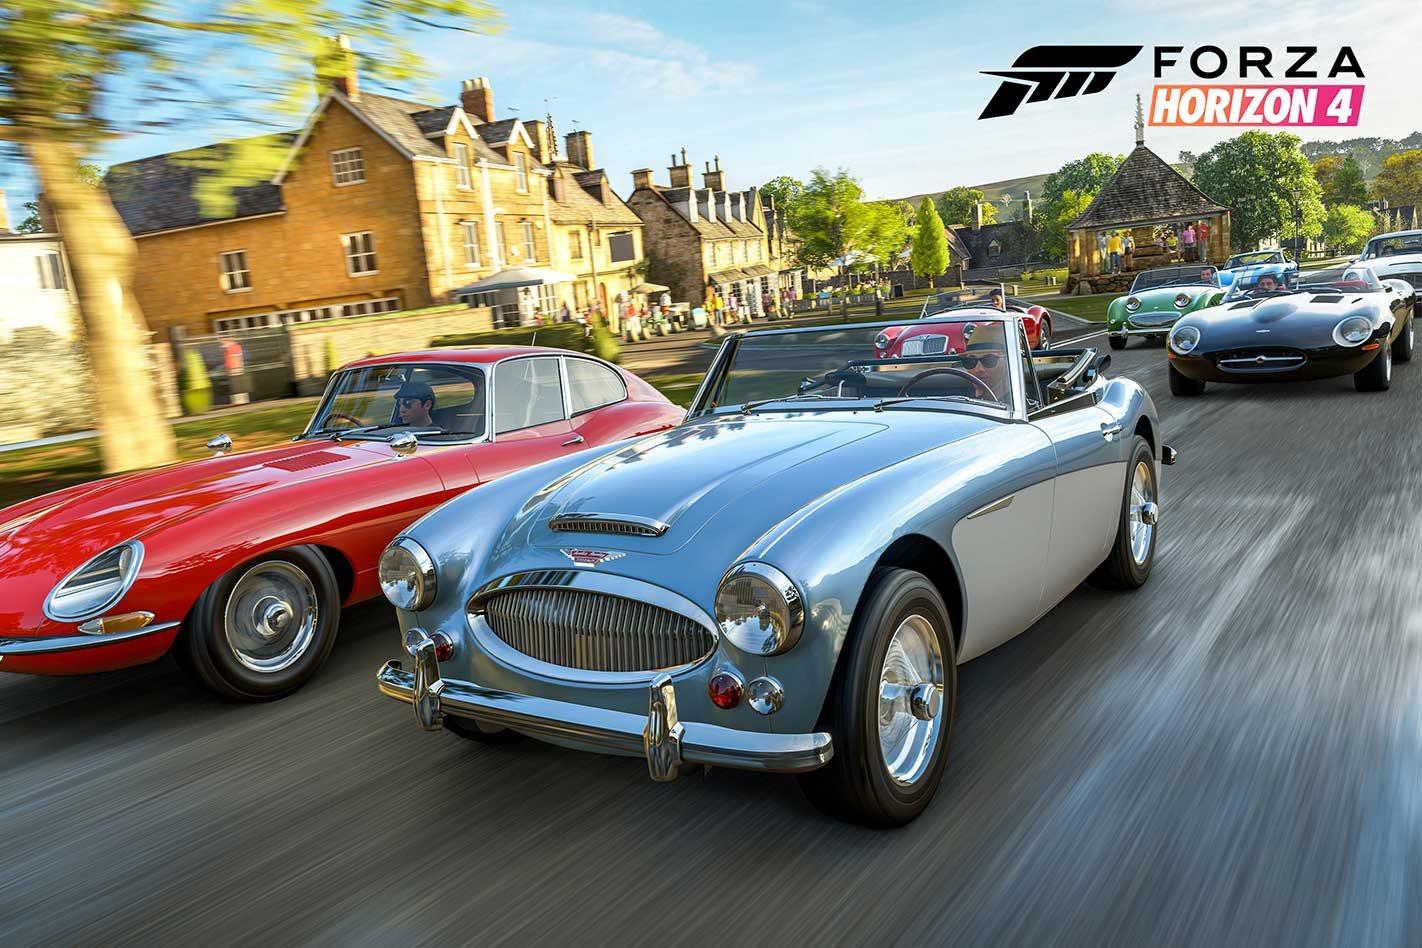 Forza Horizon 4 Car List Officially Revealed